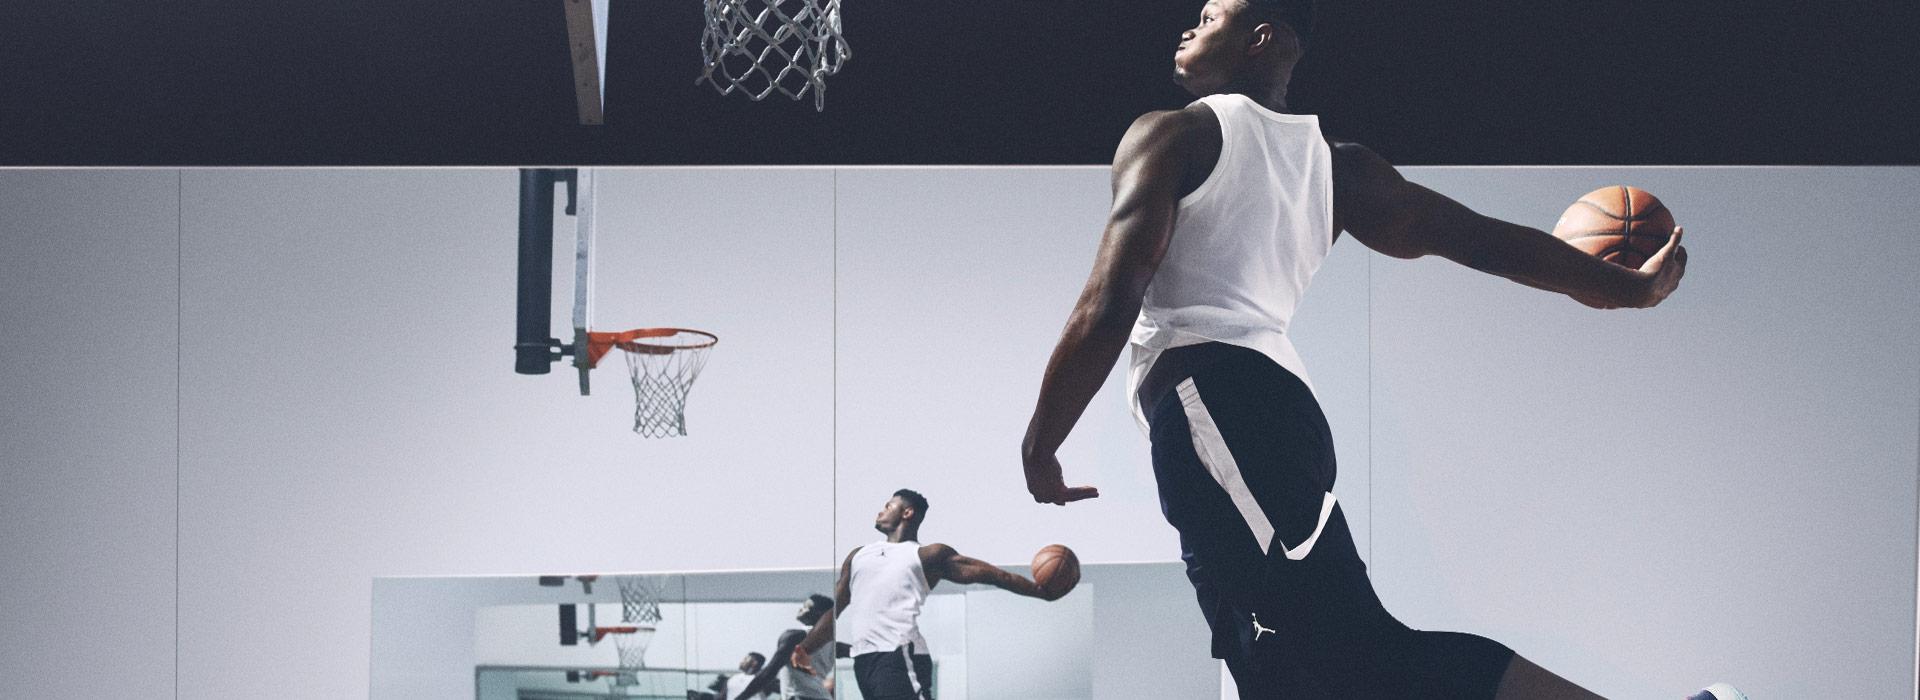 mondo basket